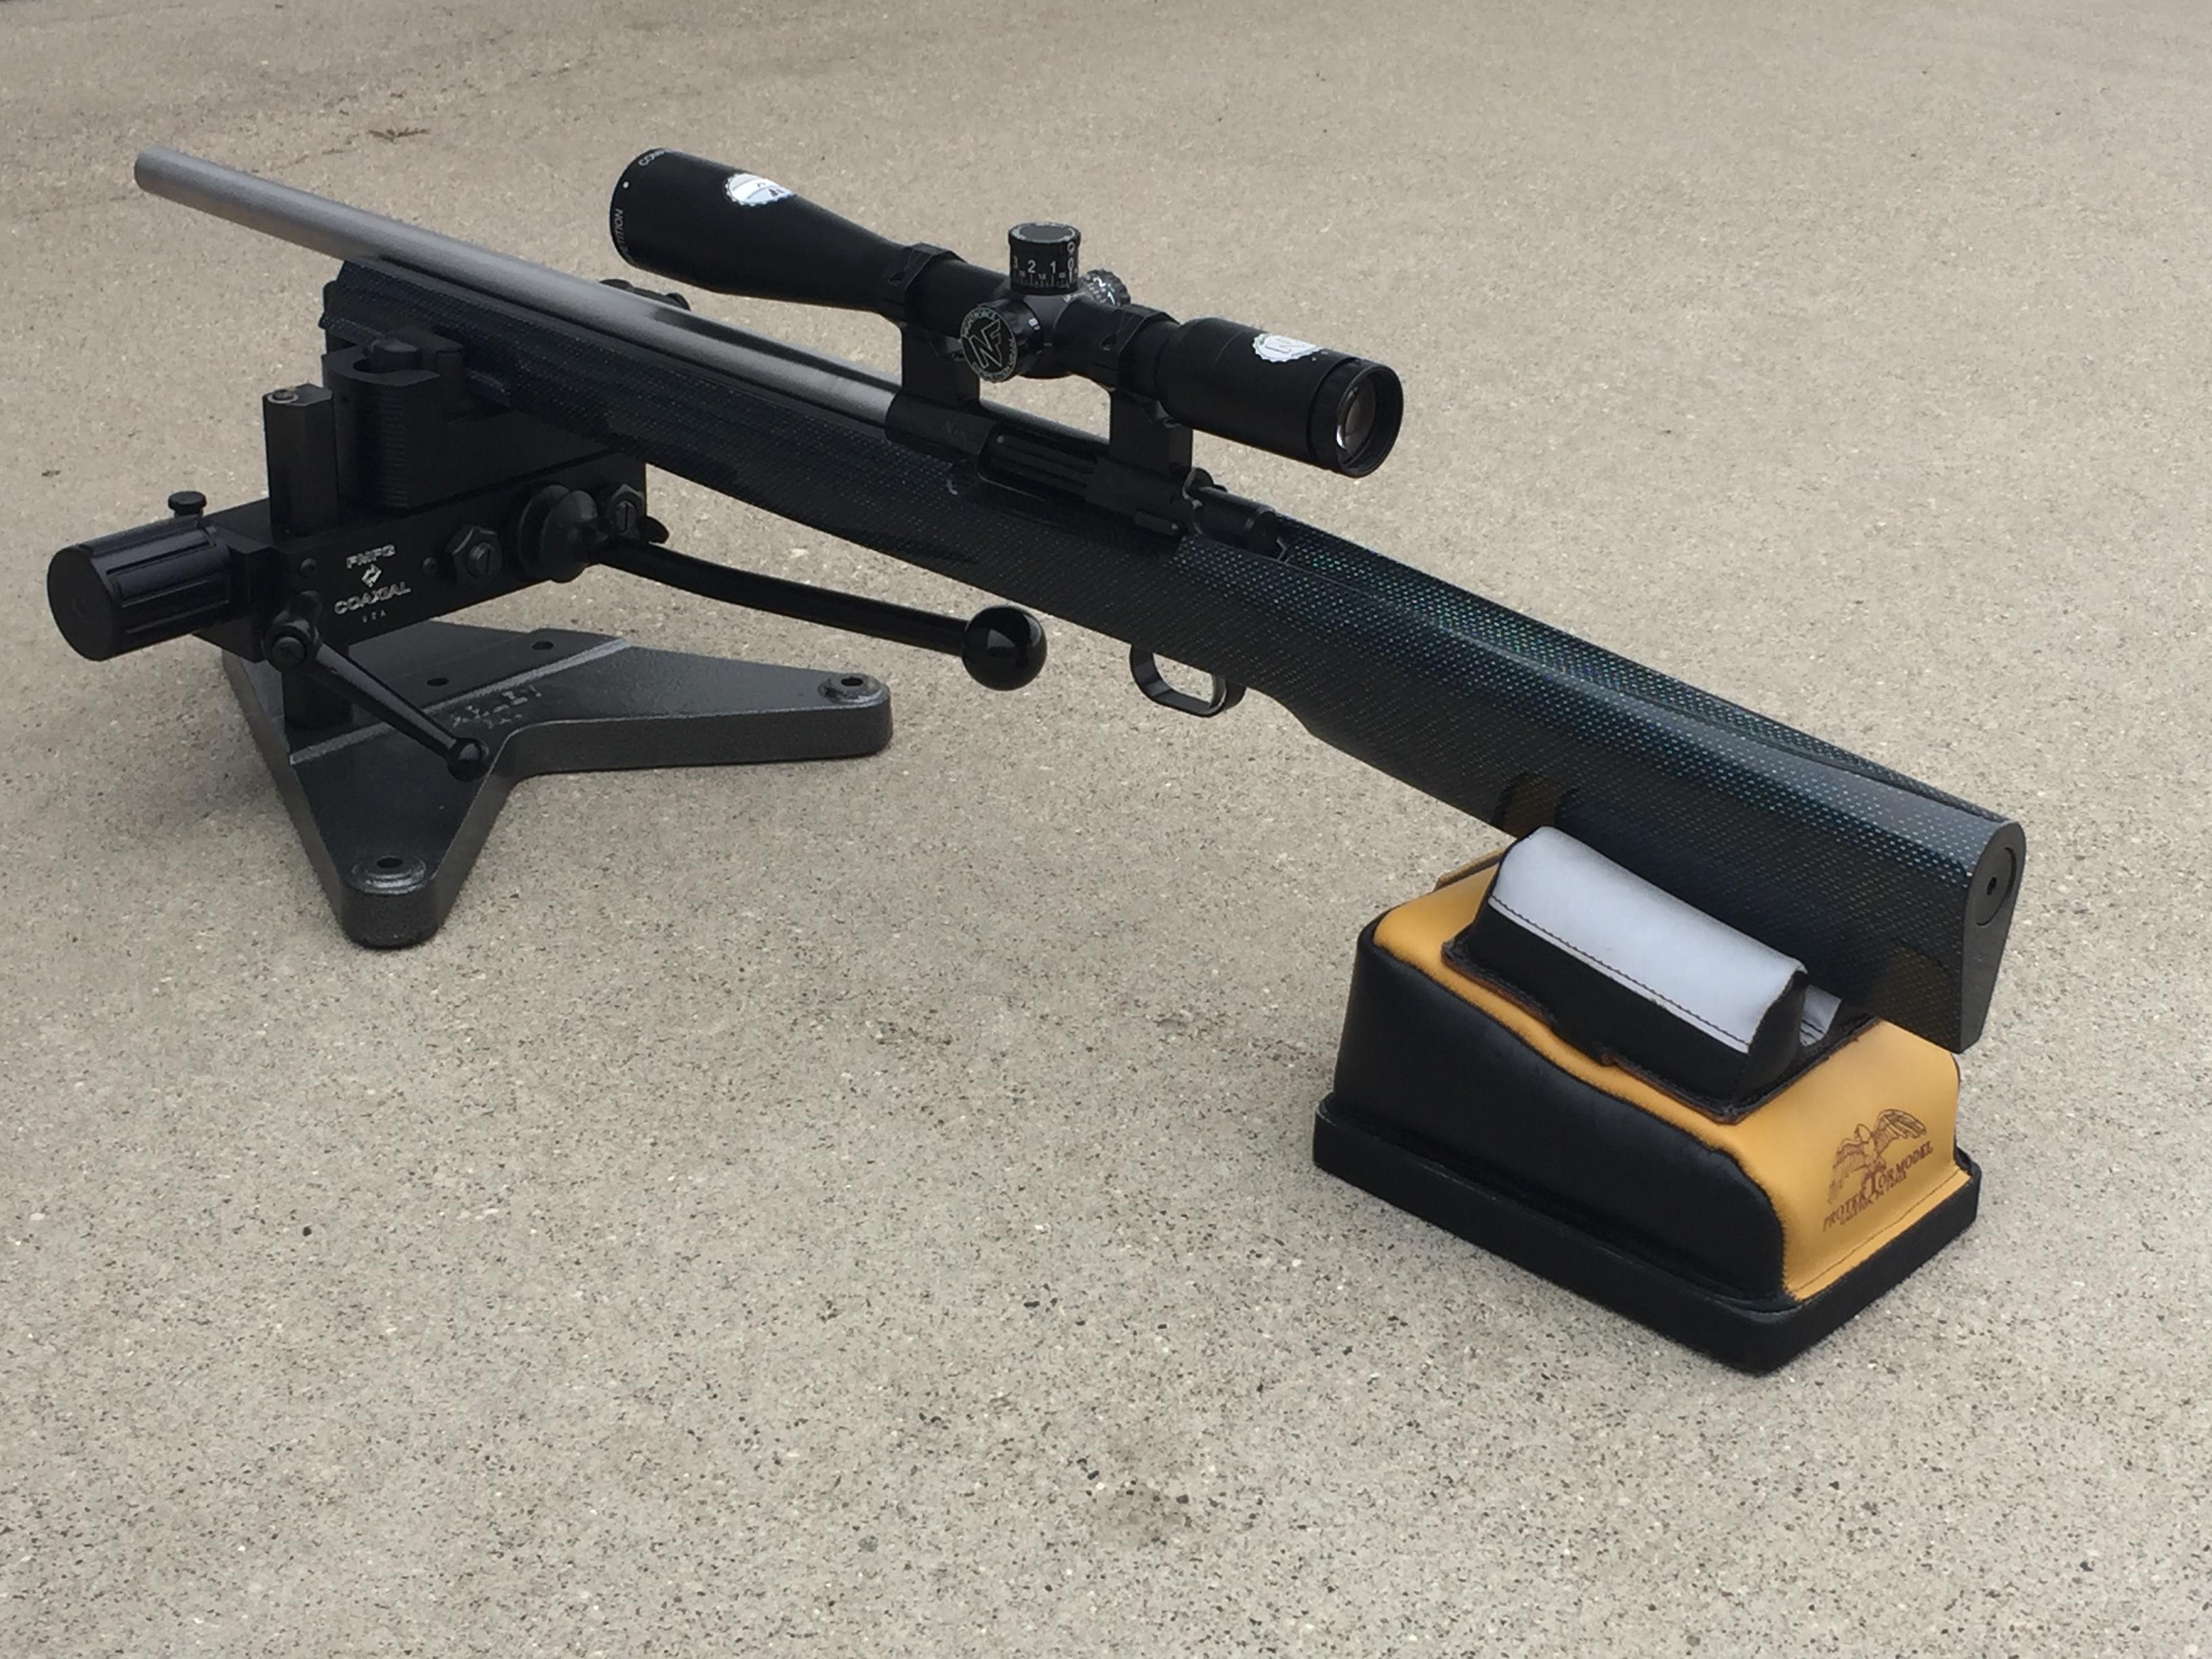 prodotto benchrest cal vendita rest noce walnut armi bench stock online calcio mm ataman